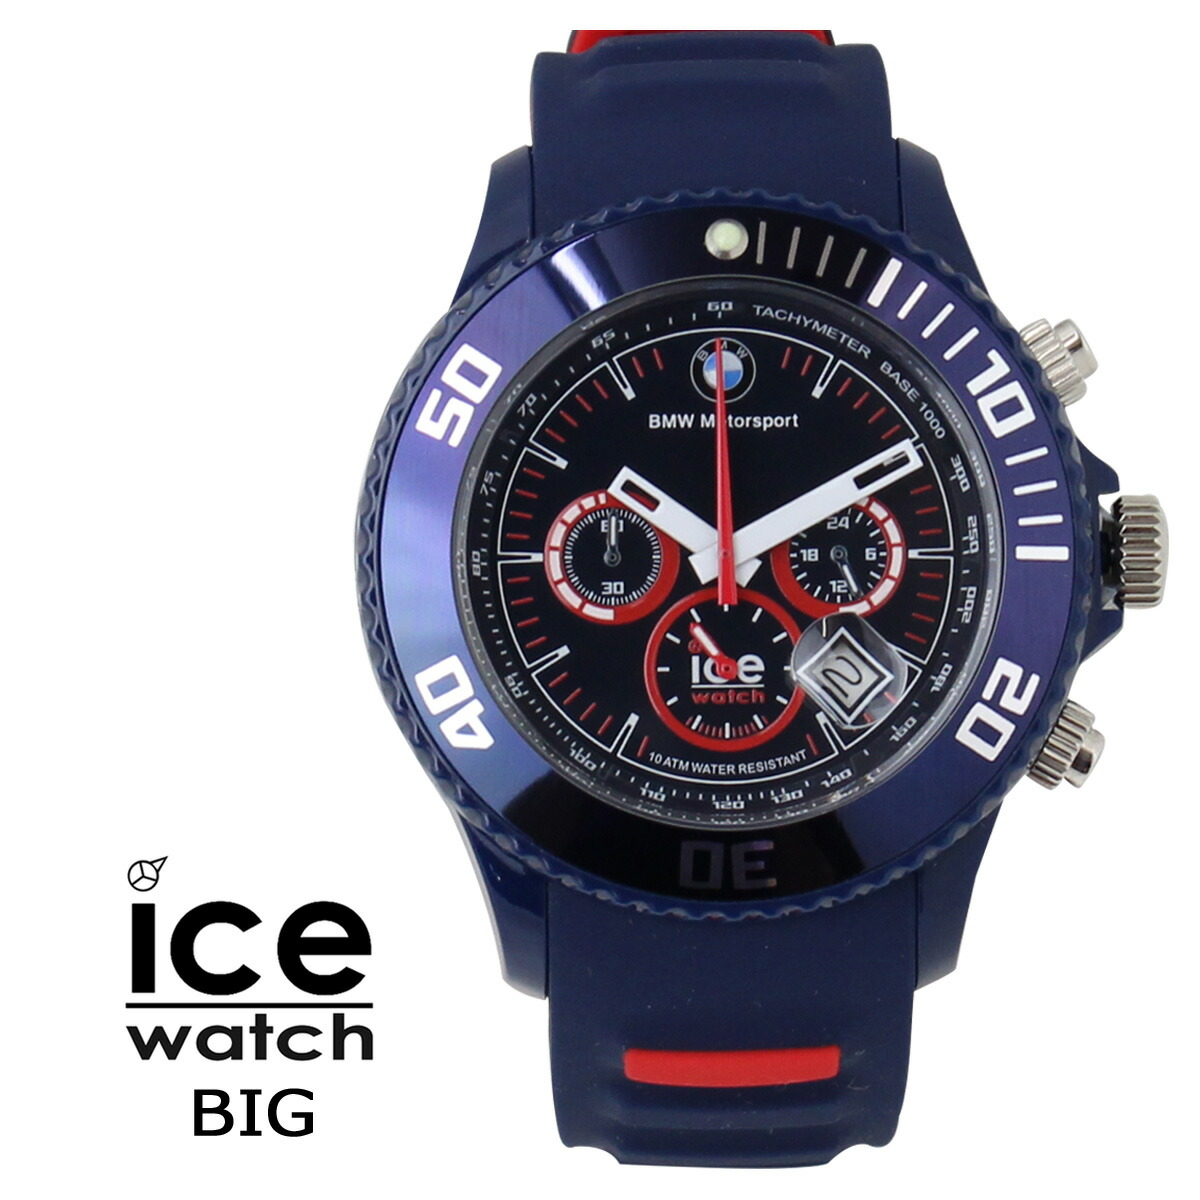 allsports rakuten global market ice watch ice watch mens watch bmw motorsport big 48 mm bm. Black Bedroom Furniture Sets. Home Design Ideas